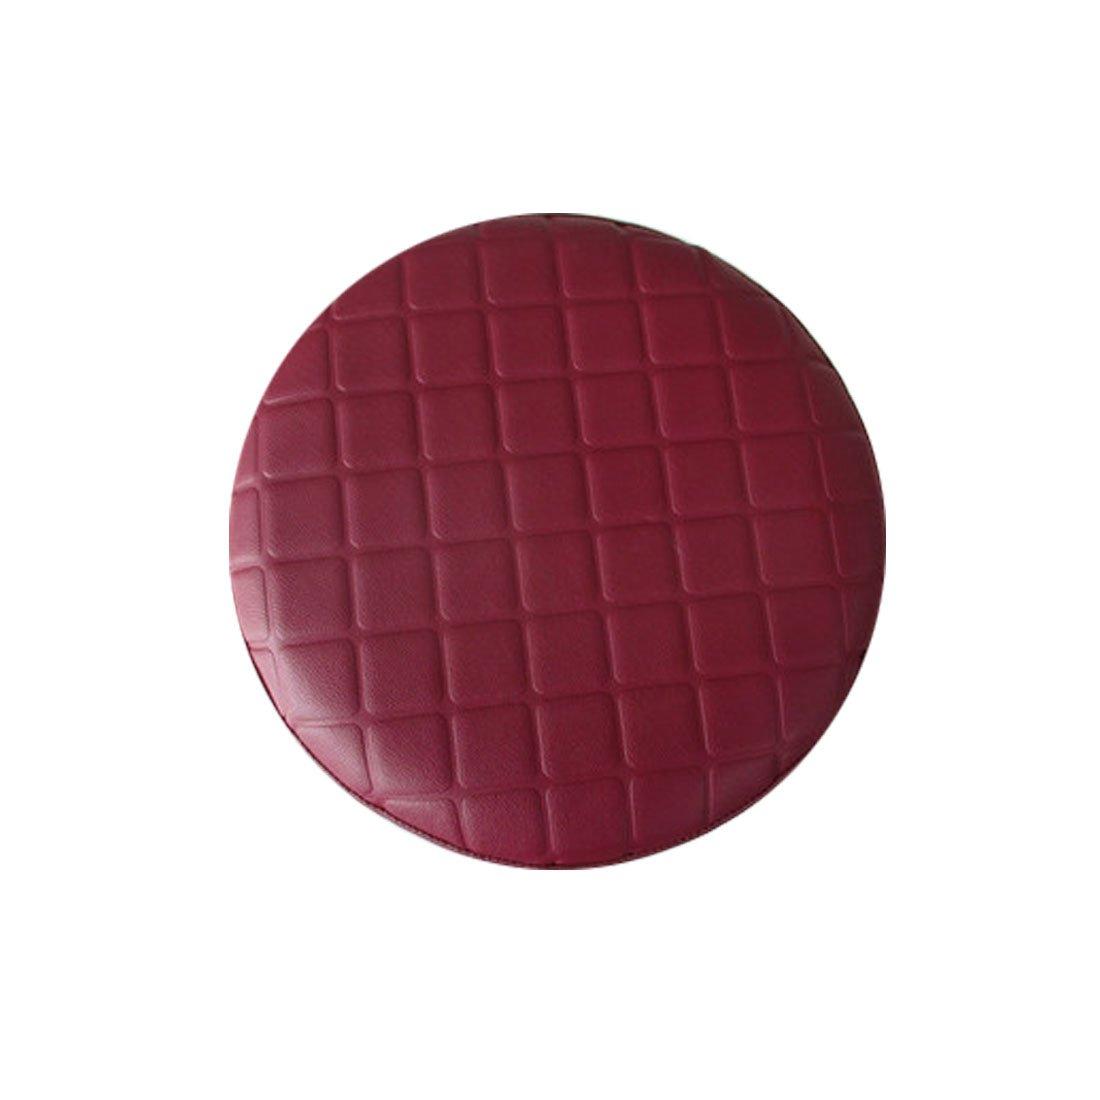 Rosavida 16 Inch Waterproof Round Stool Cover Faux Leather Lattice Round Barstool Seat Covers Red-wine by Rosavida